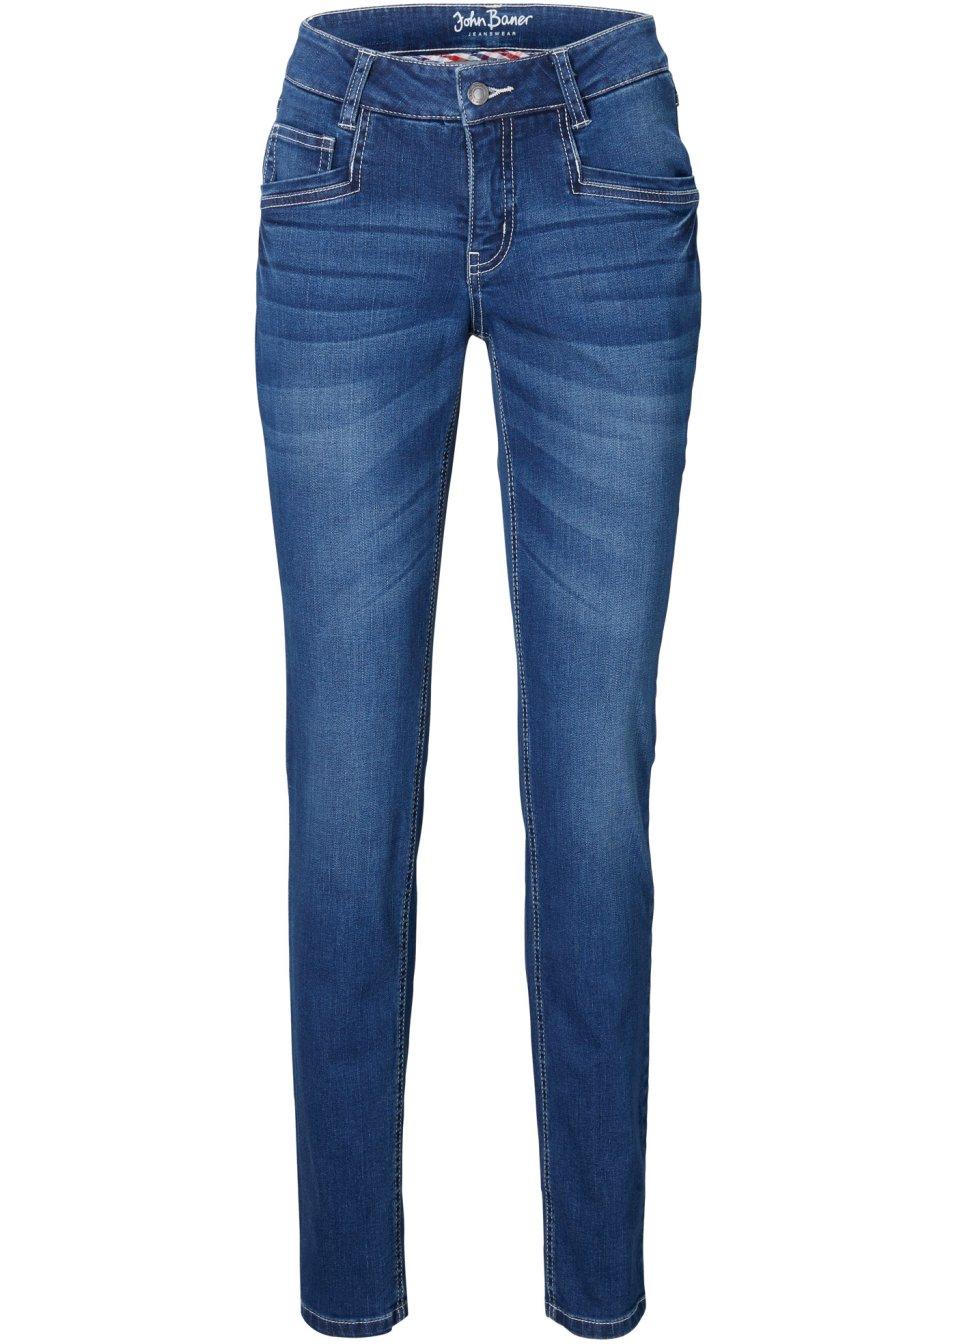 Stretch-Jeans Skinny blau - Damen - bonprix.de eGMZD M9EFG